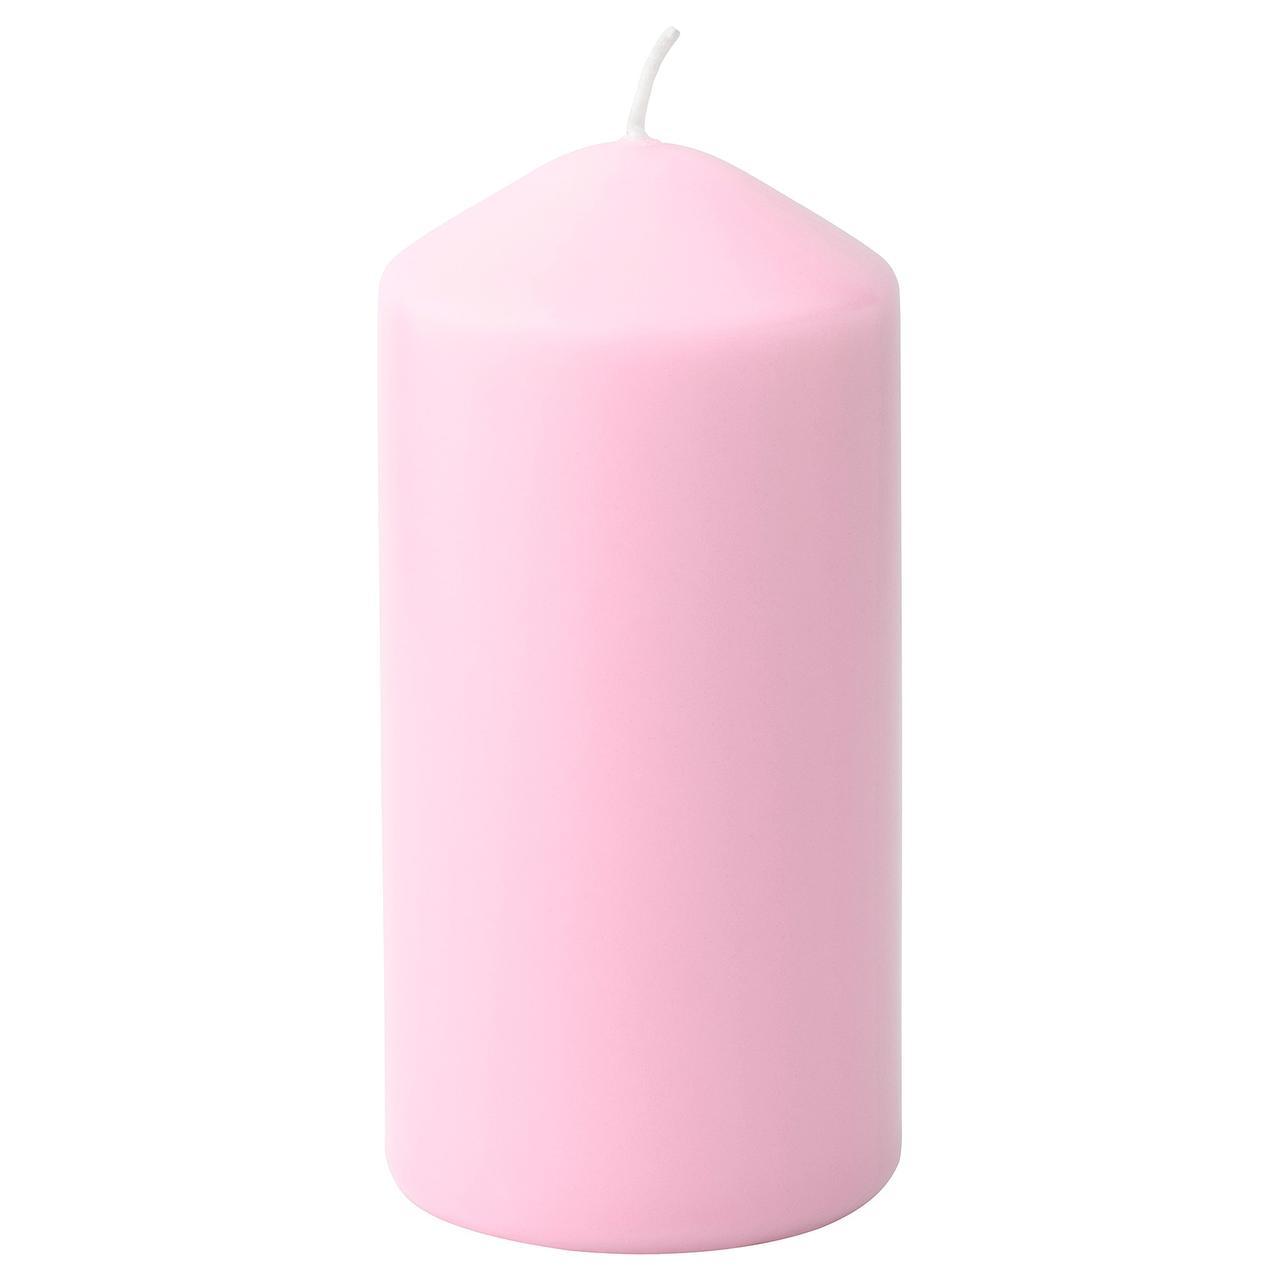 ДАГЛИГЕН Неароматич свеча формовая, розовый